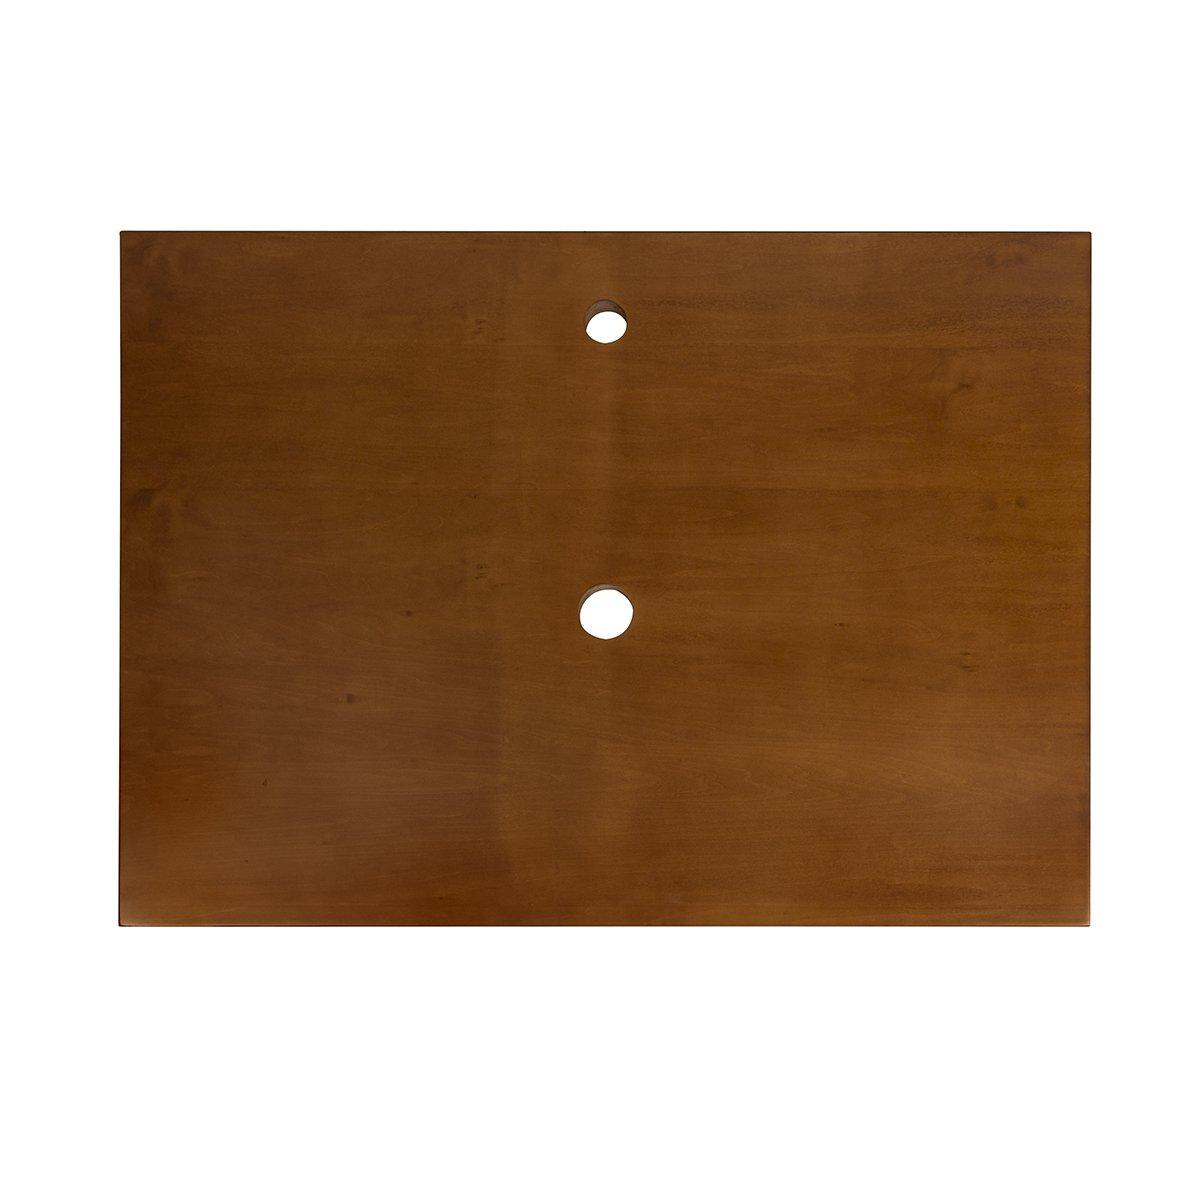 Cinnamon 518331-1-F08 Ronbow Essentials 31 Wood Top W//Single Faucet /& Drain Holes